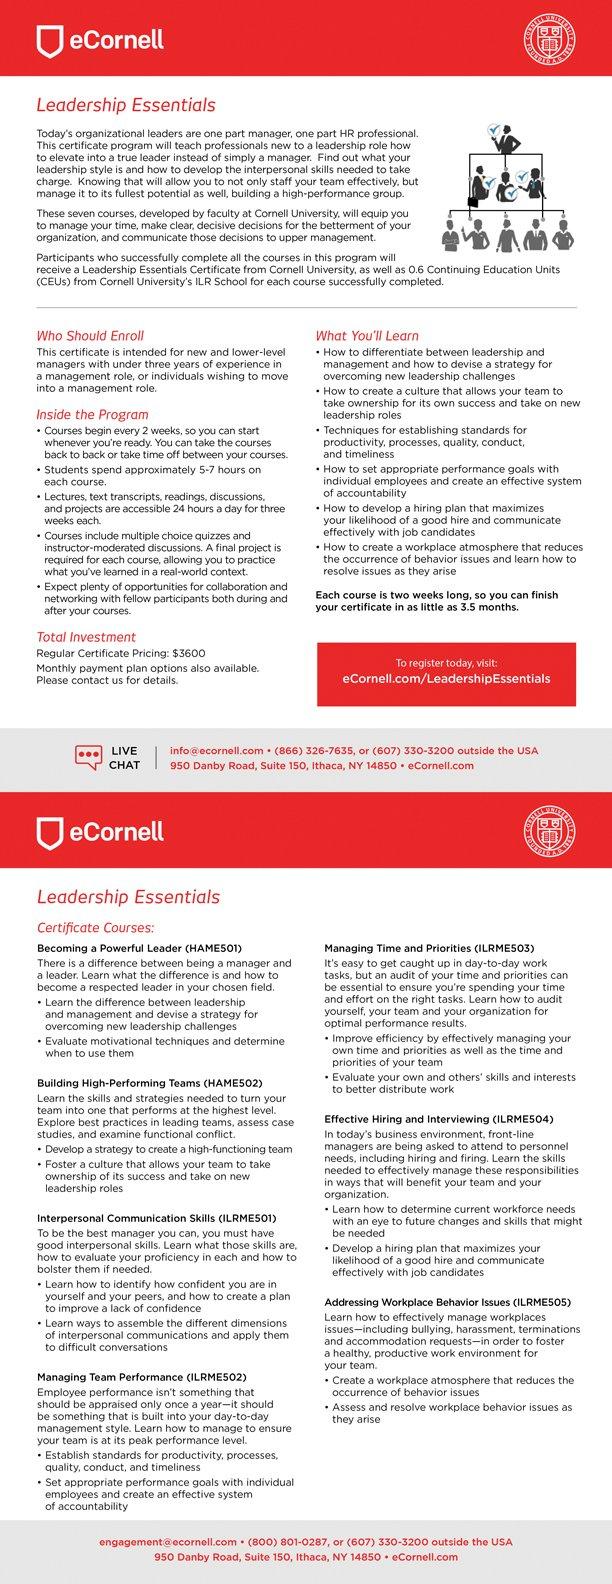 Leadership Essentials Flyer